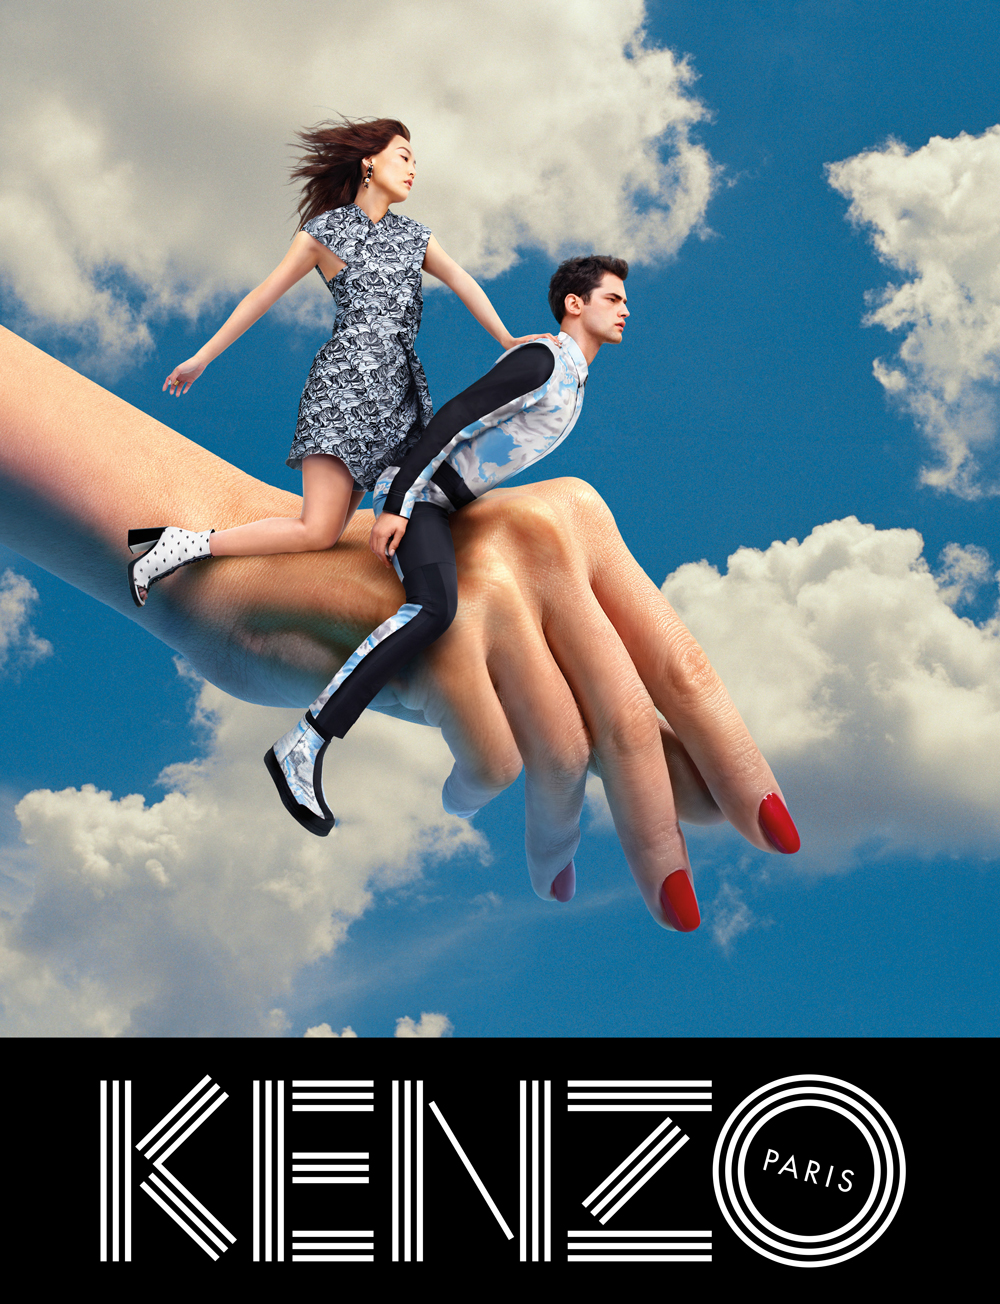 Rinko Kikuchi, Sean O'Pry for Kenzo fall/winter 2013 ad campaign